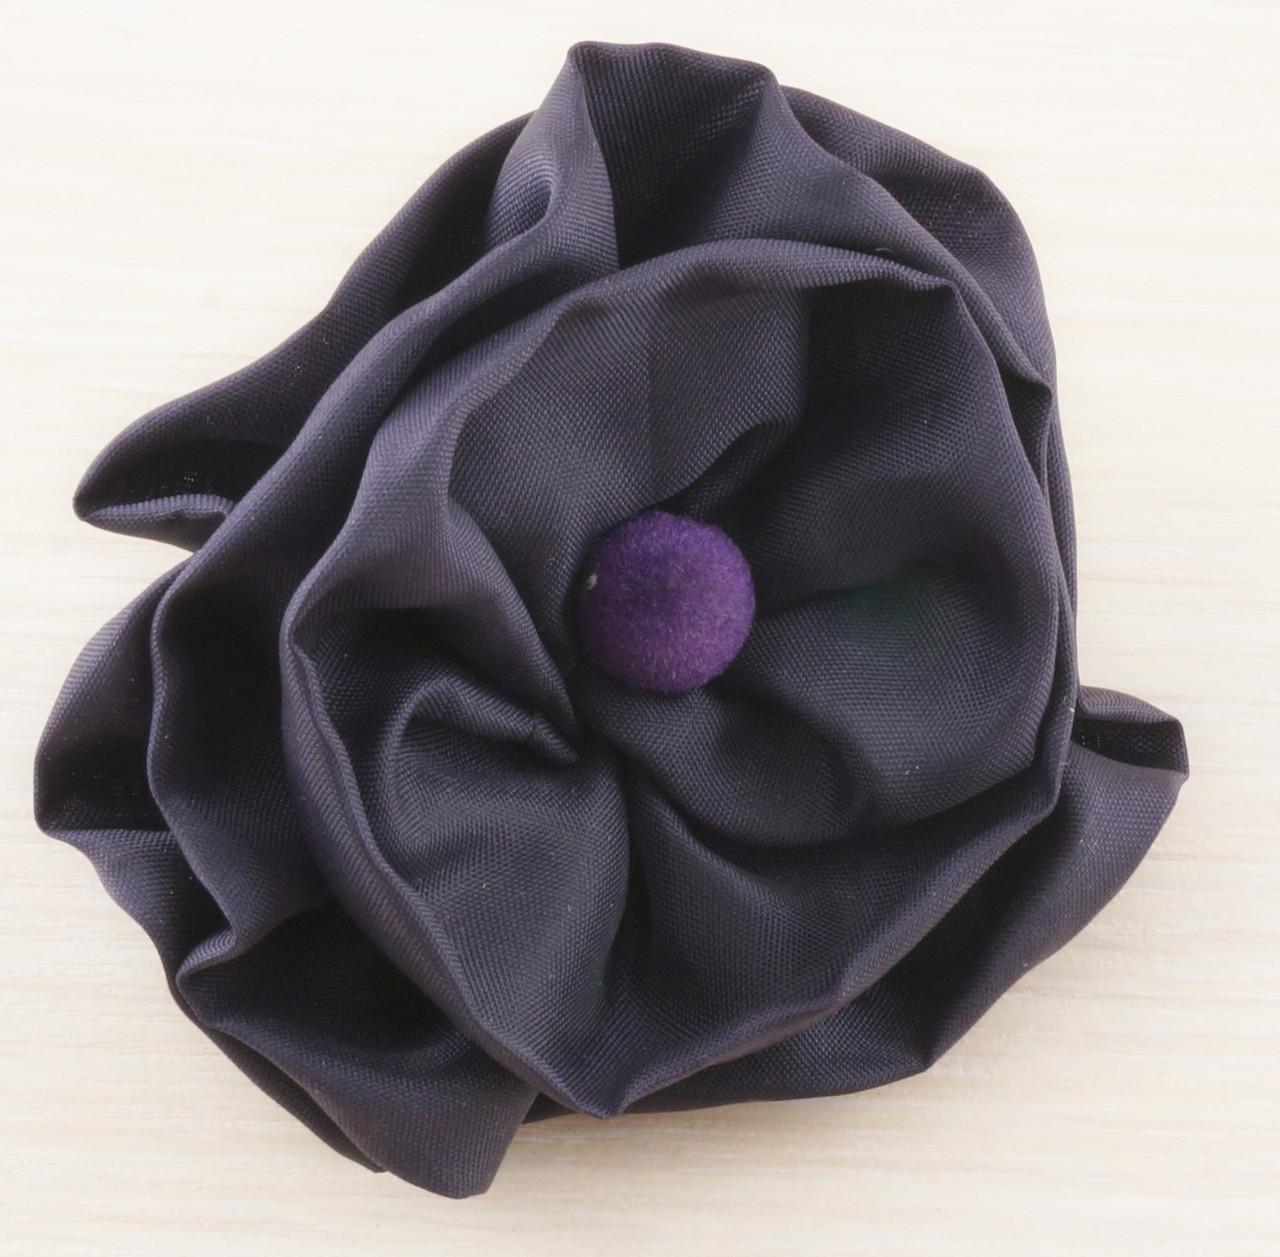 Брошь цветок фиолетовый 80мм (товар при заказе от 200 грн) - магазин-студия Цацки в Чернигове